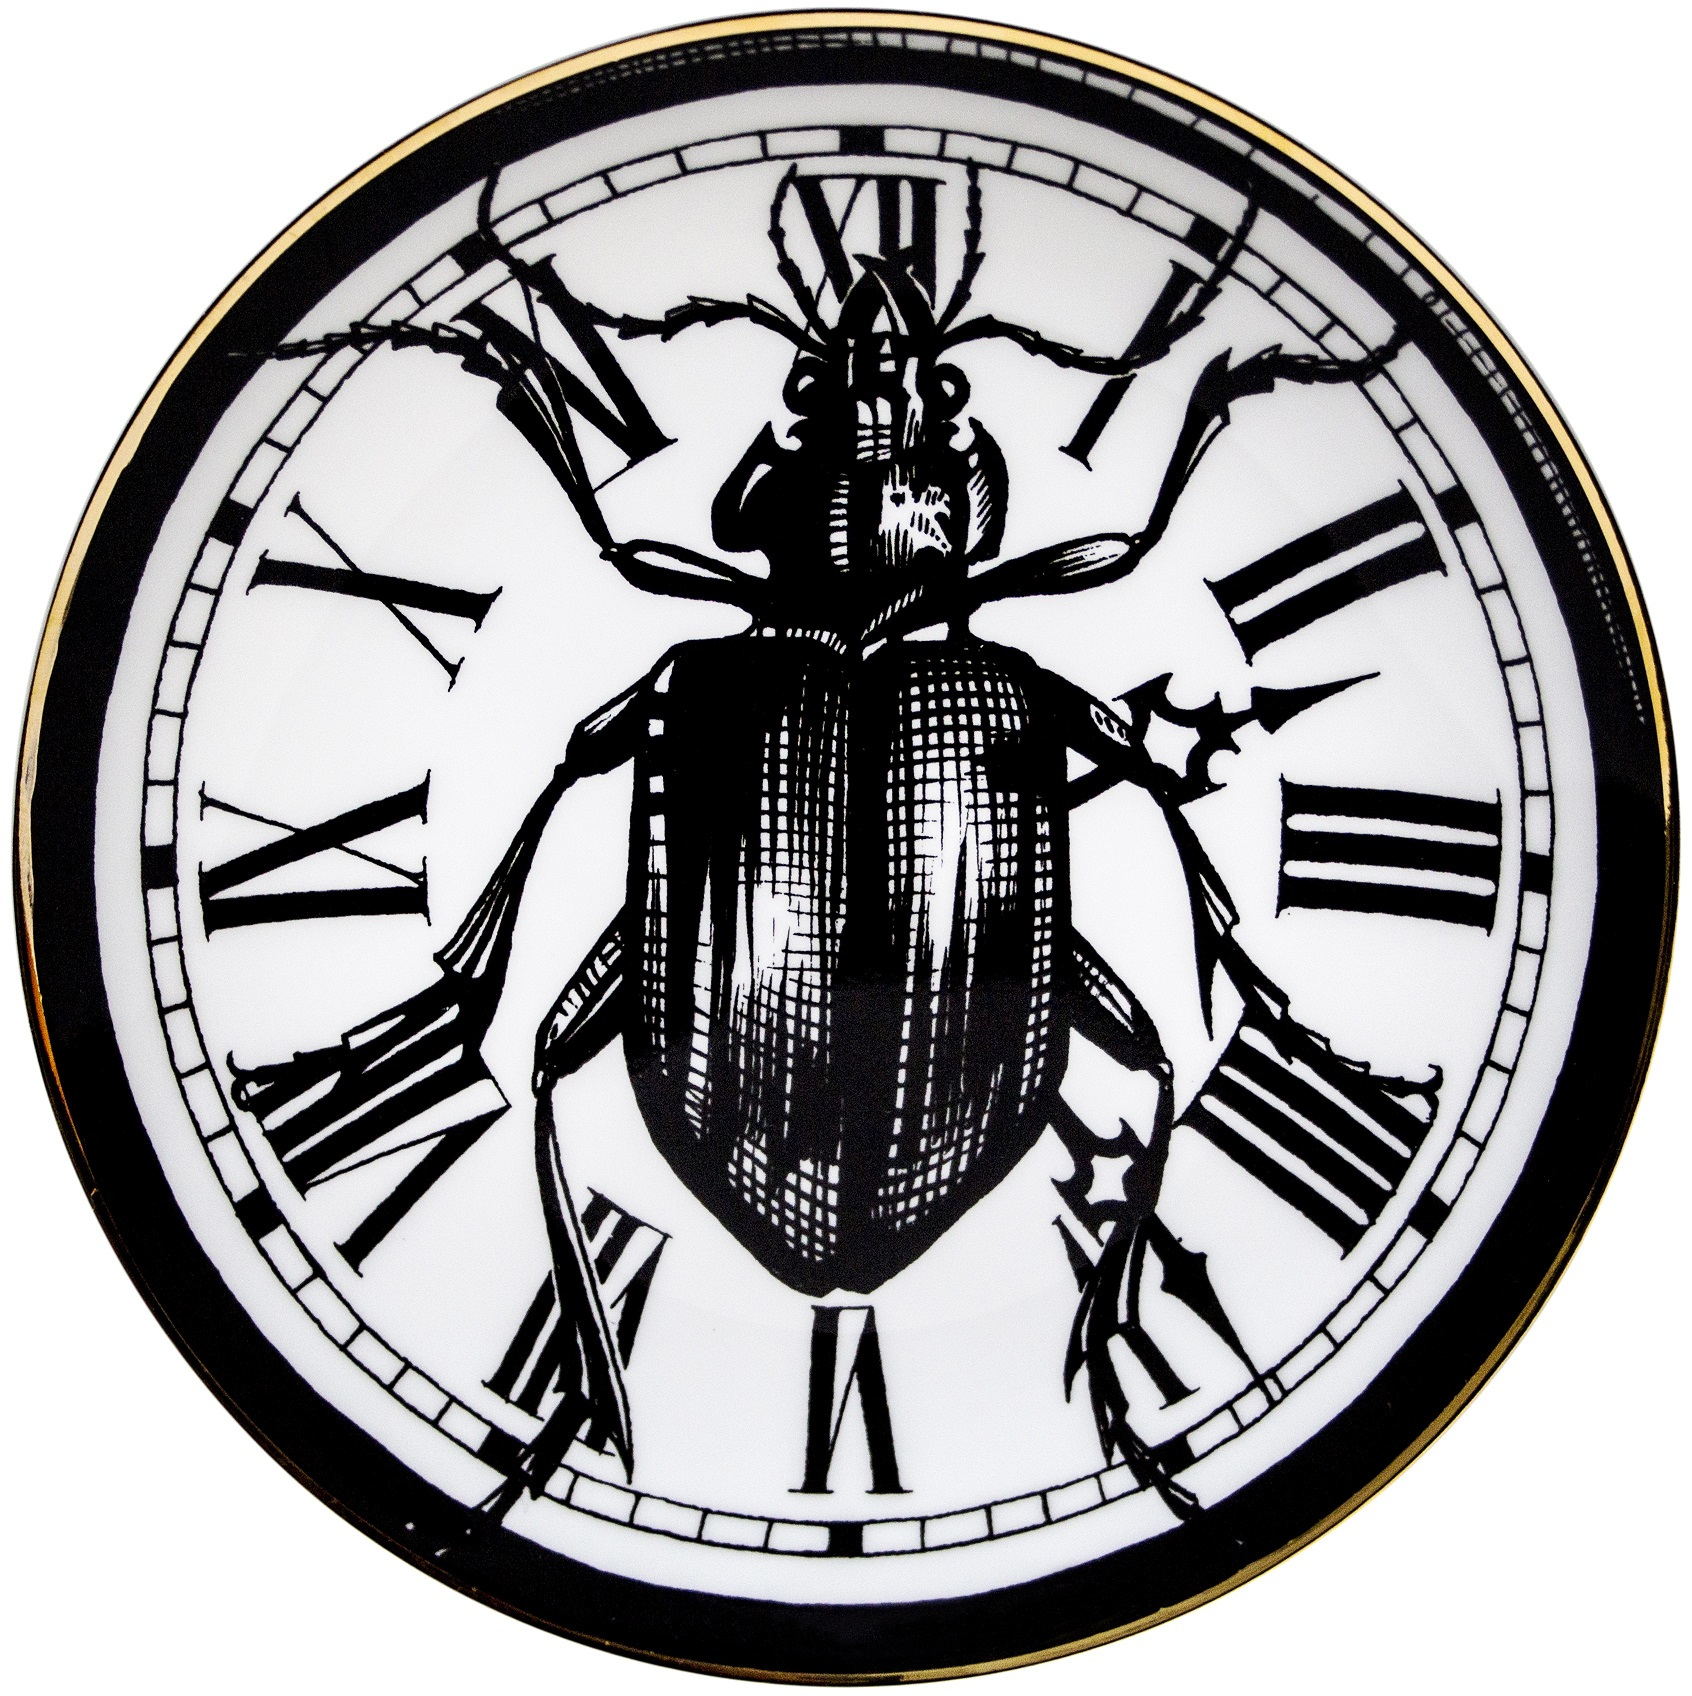 Beetleclock